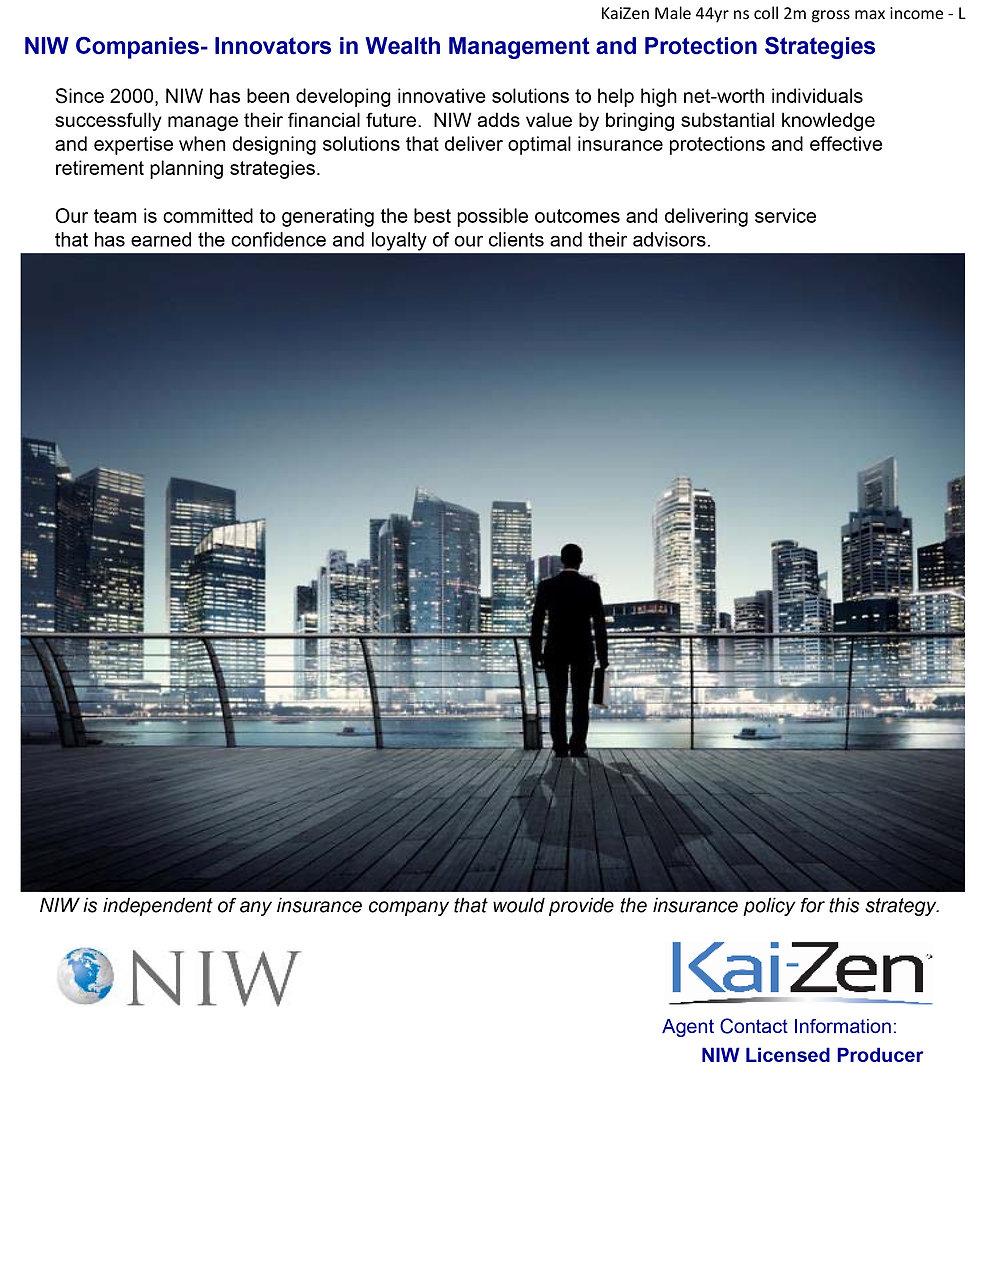 Example Kaizen-8.jpg